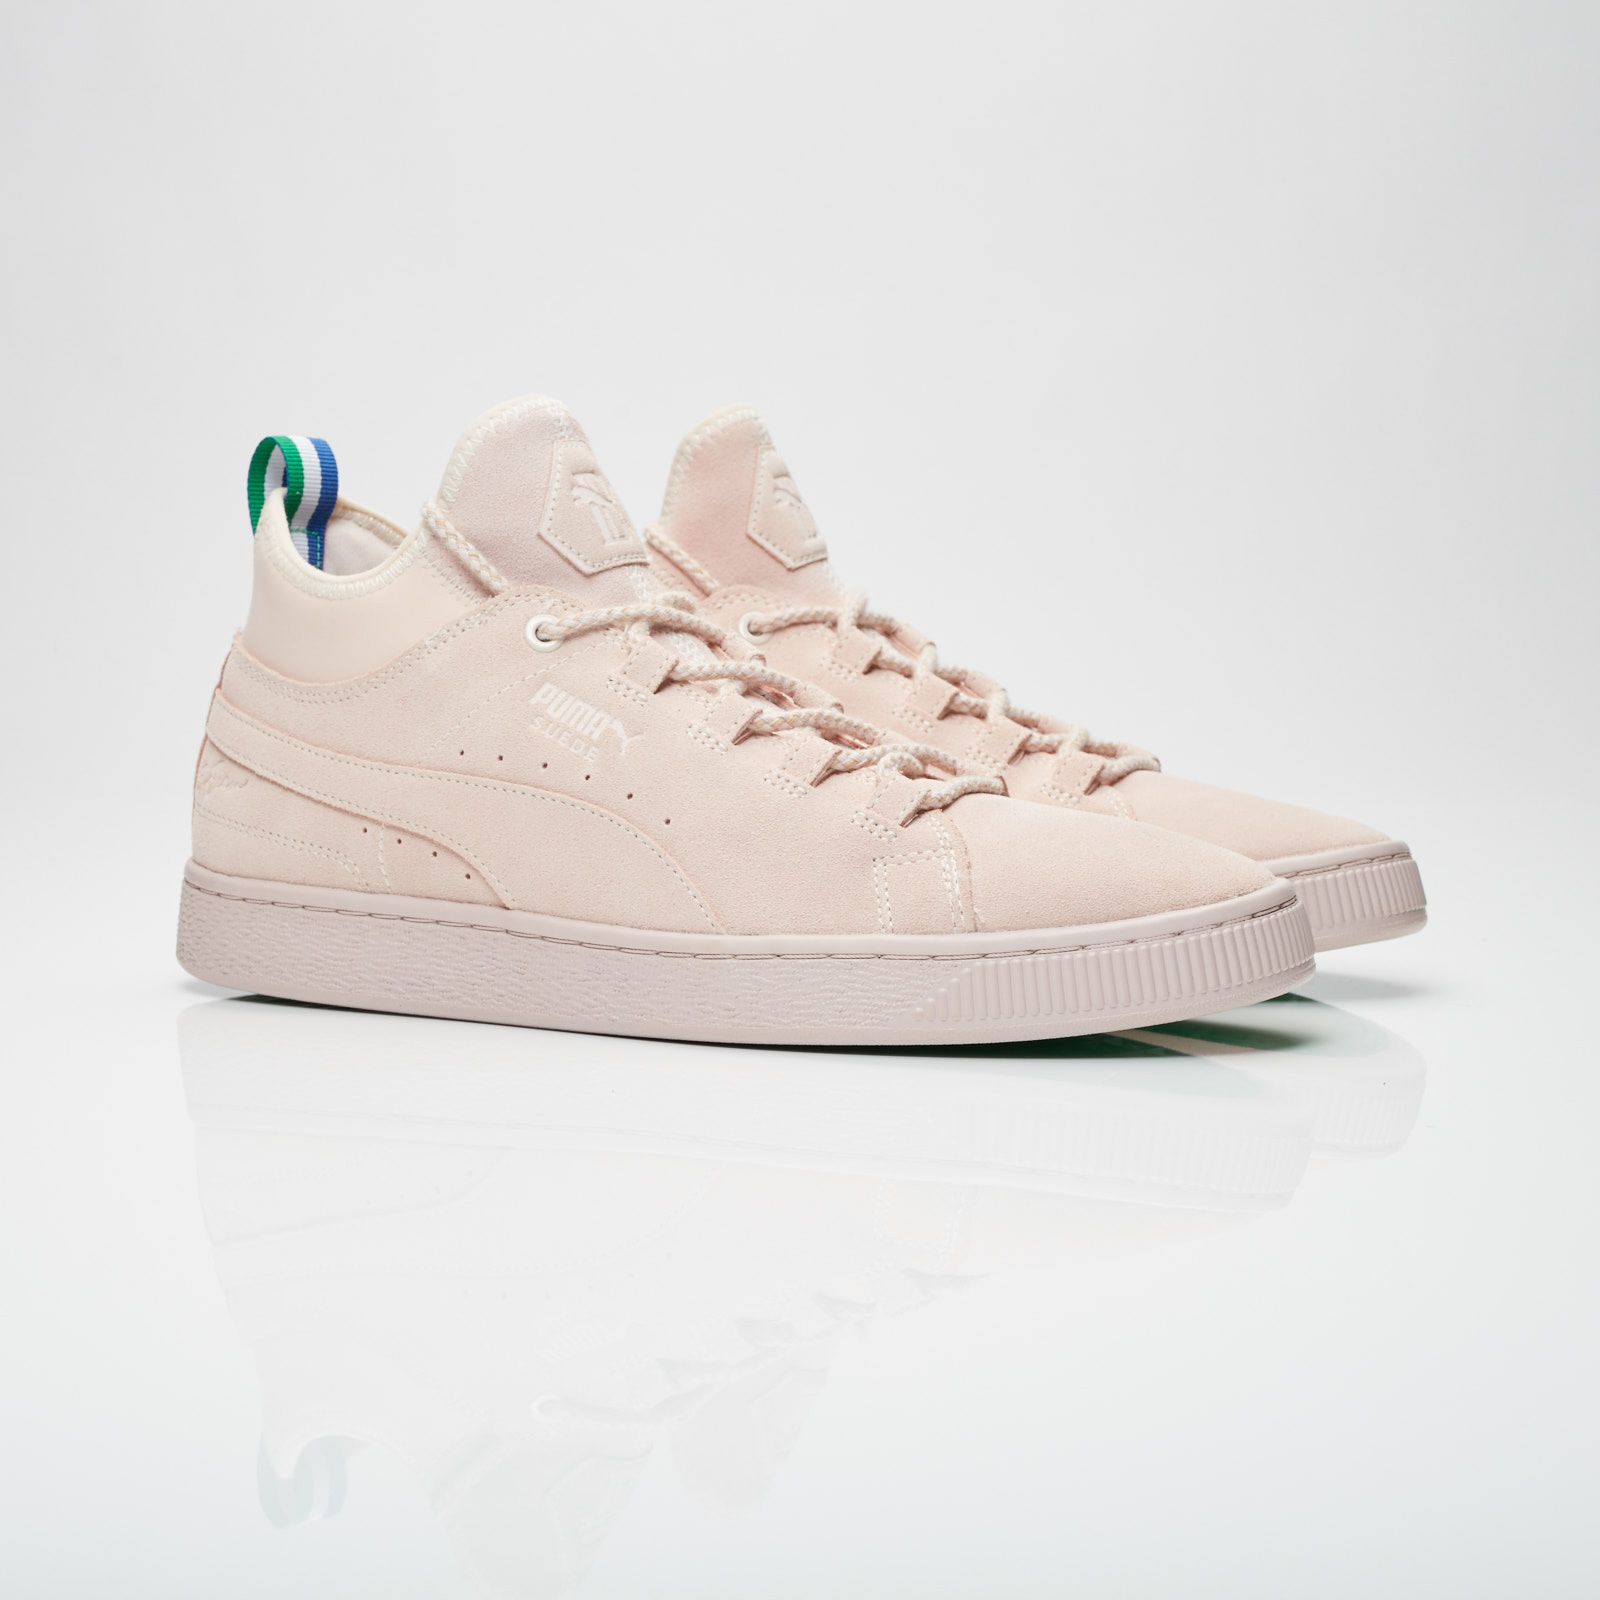 4046f4c11b1 Puma Suede Mid Big Sean - 366252-01 - Sneakersnstuff